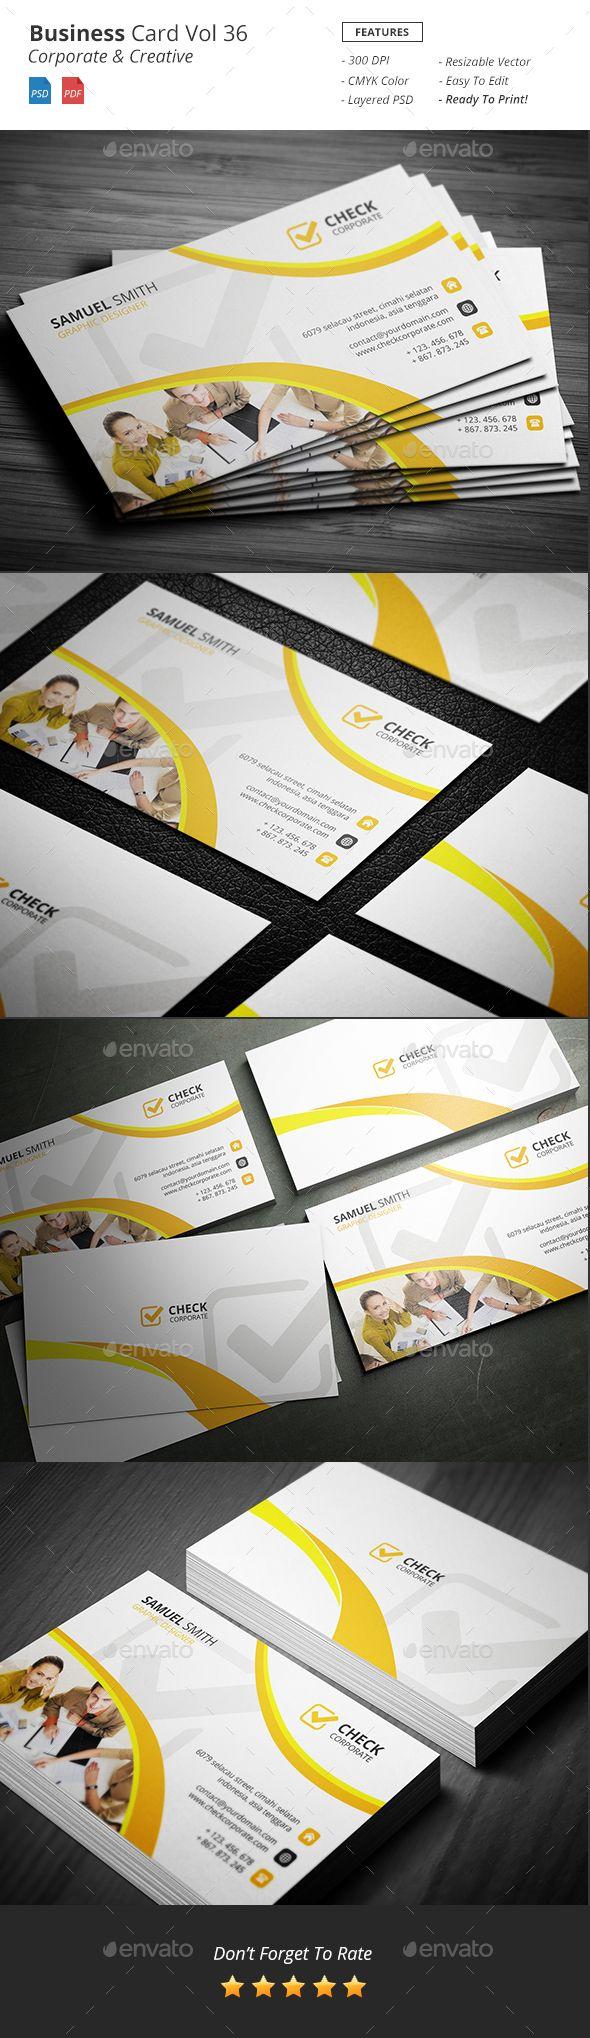 Corporate Business Card Vol 36 - Corporate Business Cards